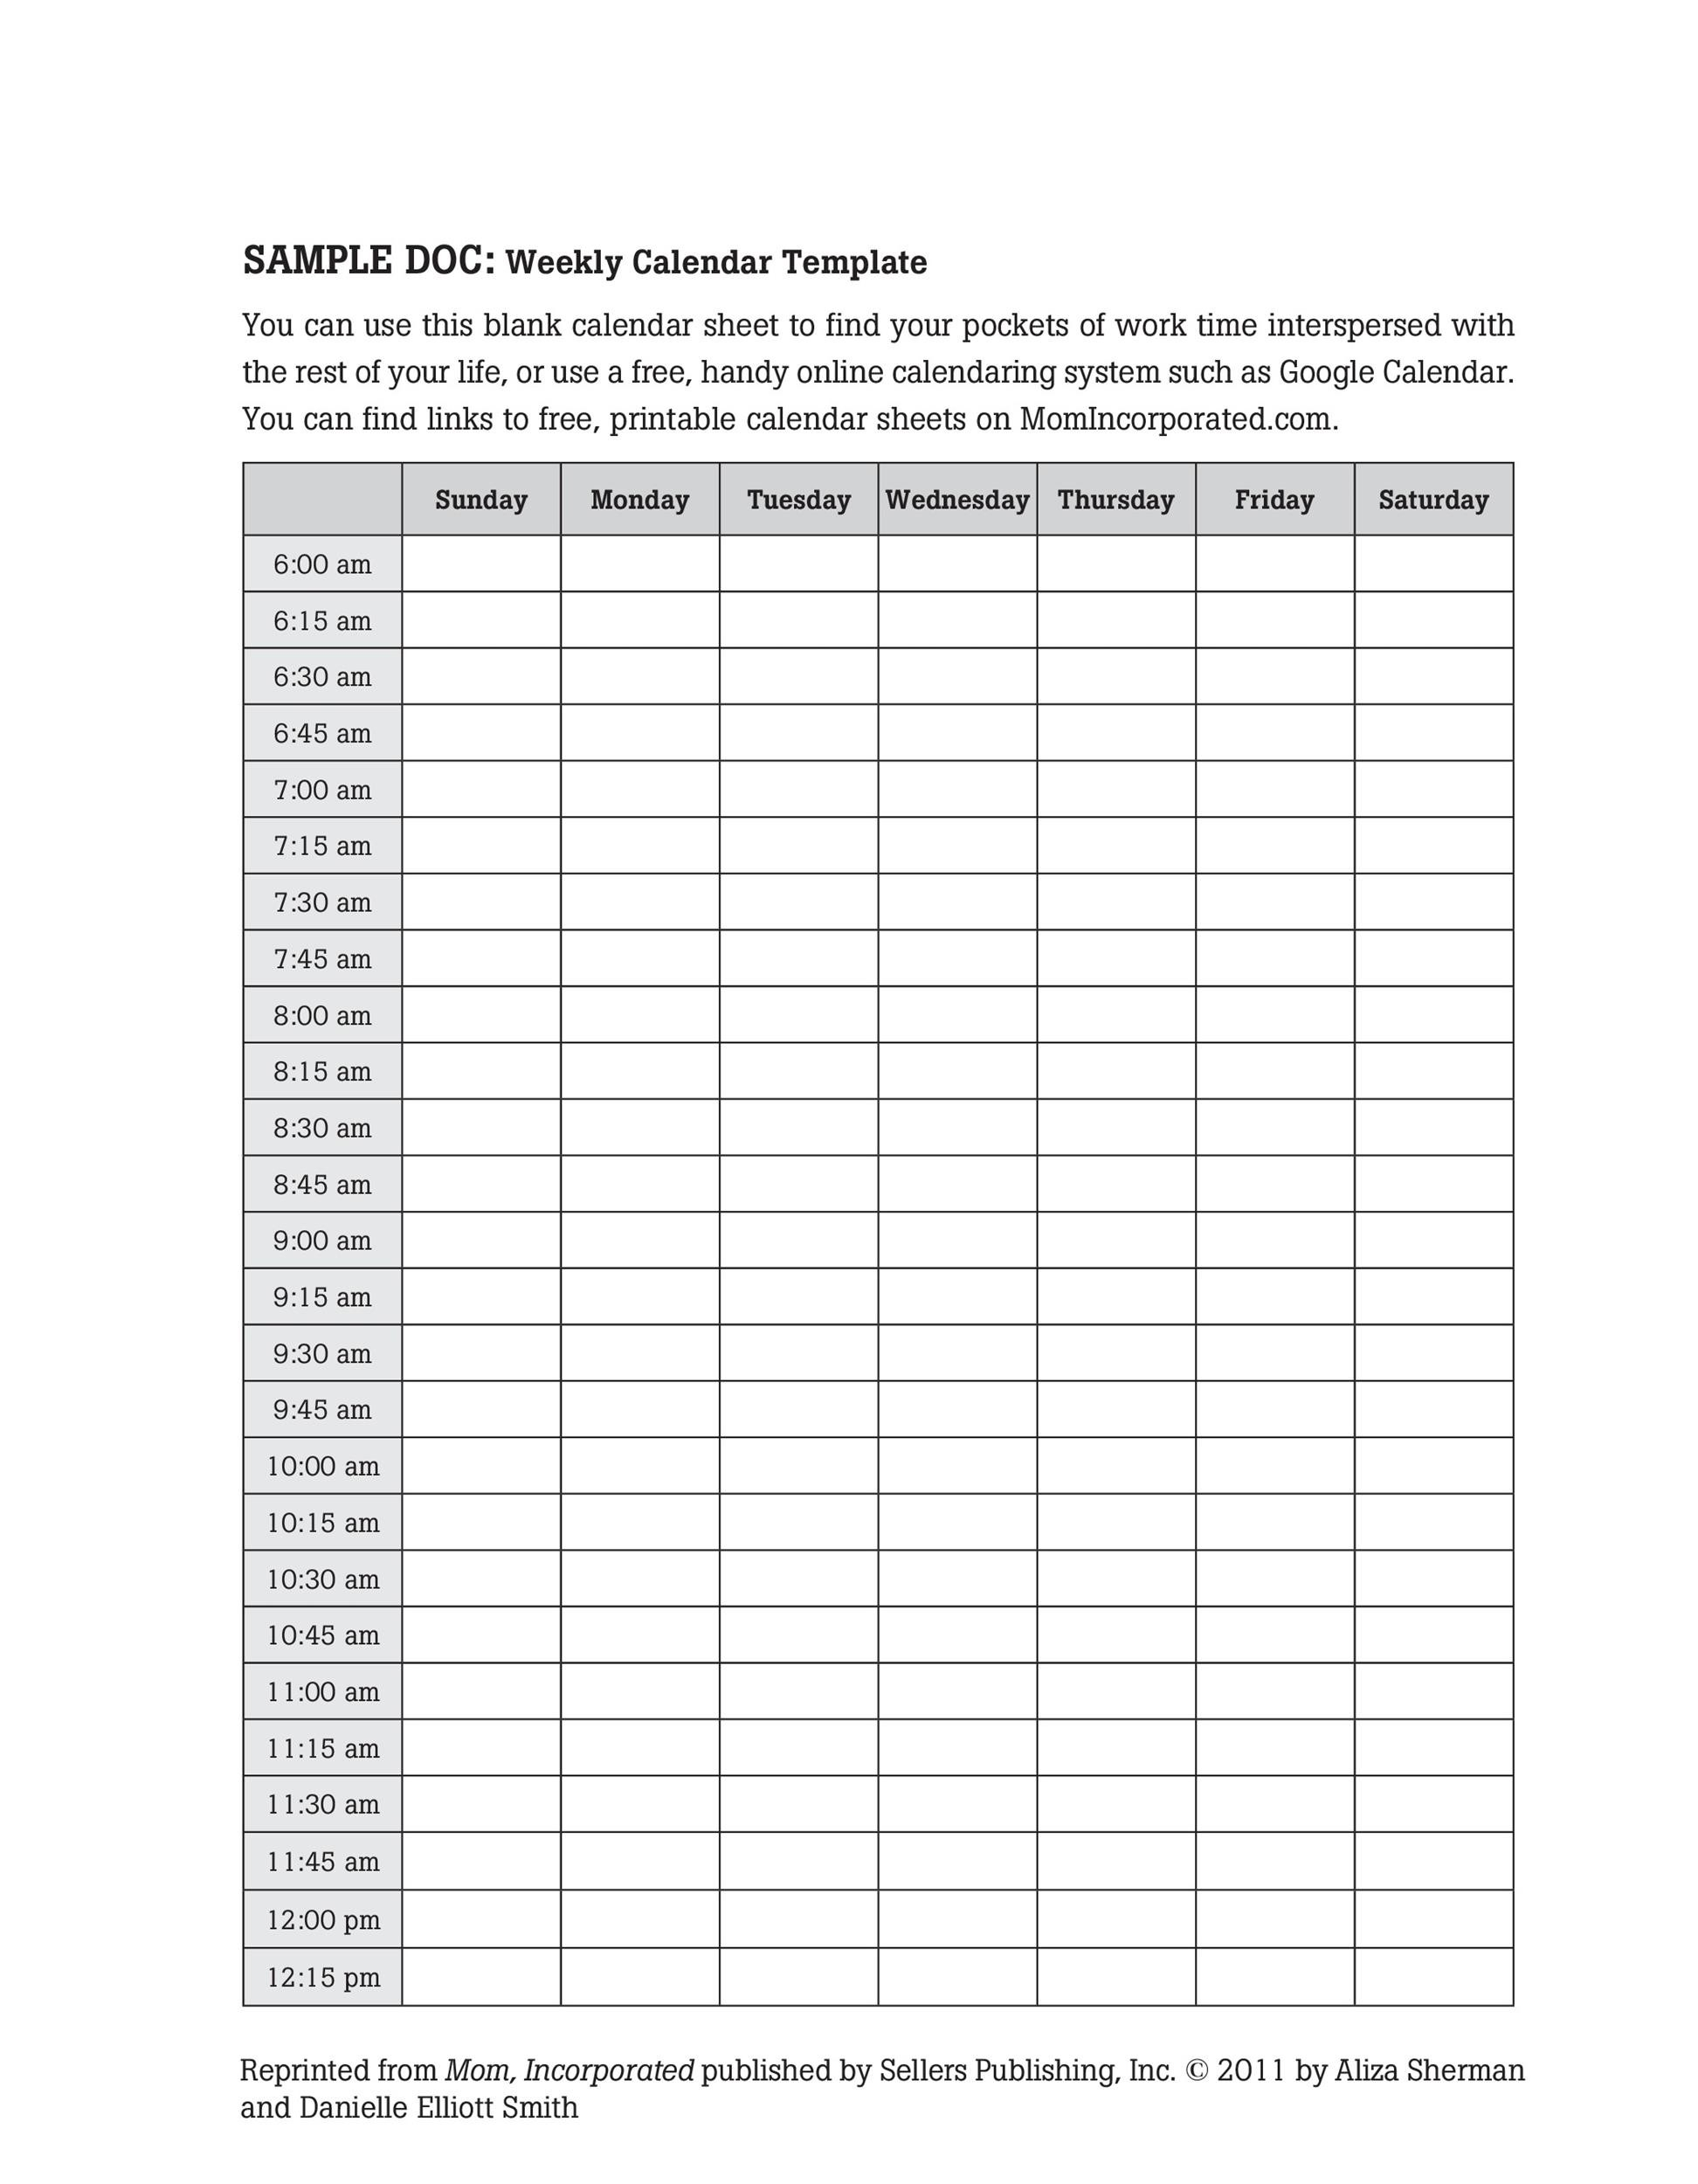 26 Blank Weekly Calendar Templates [Pdf, Excel, Word] ᐅ Templatelab